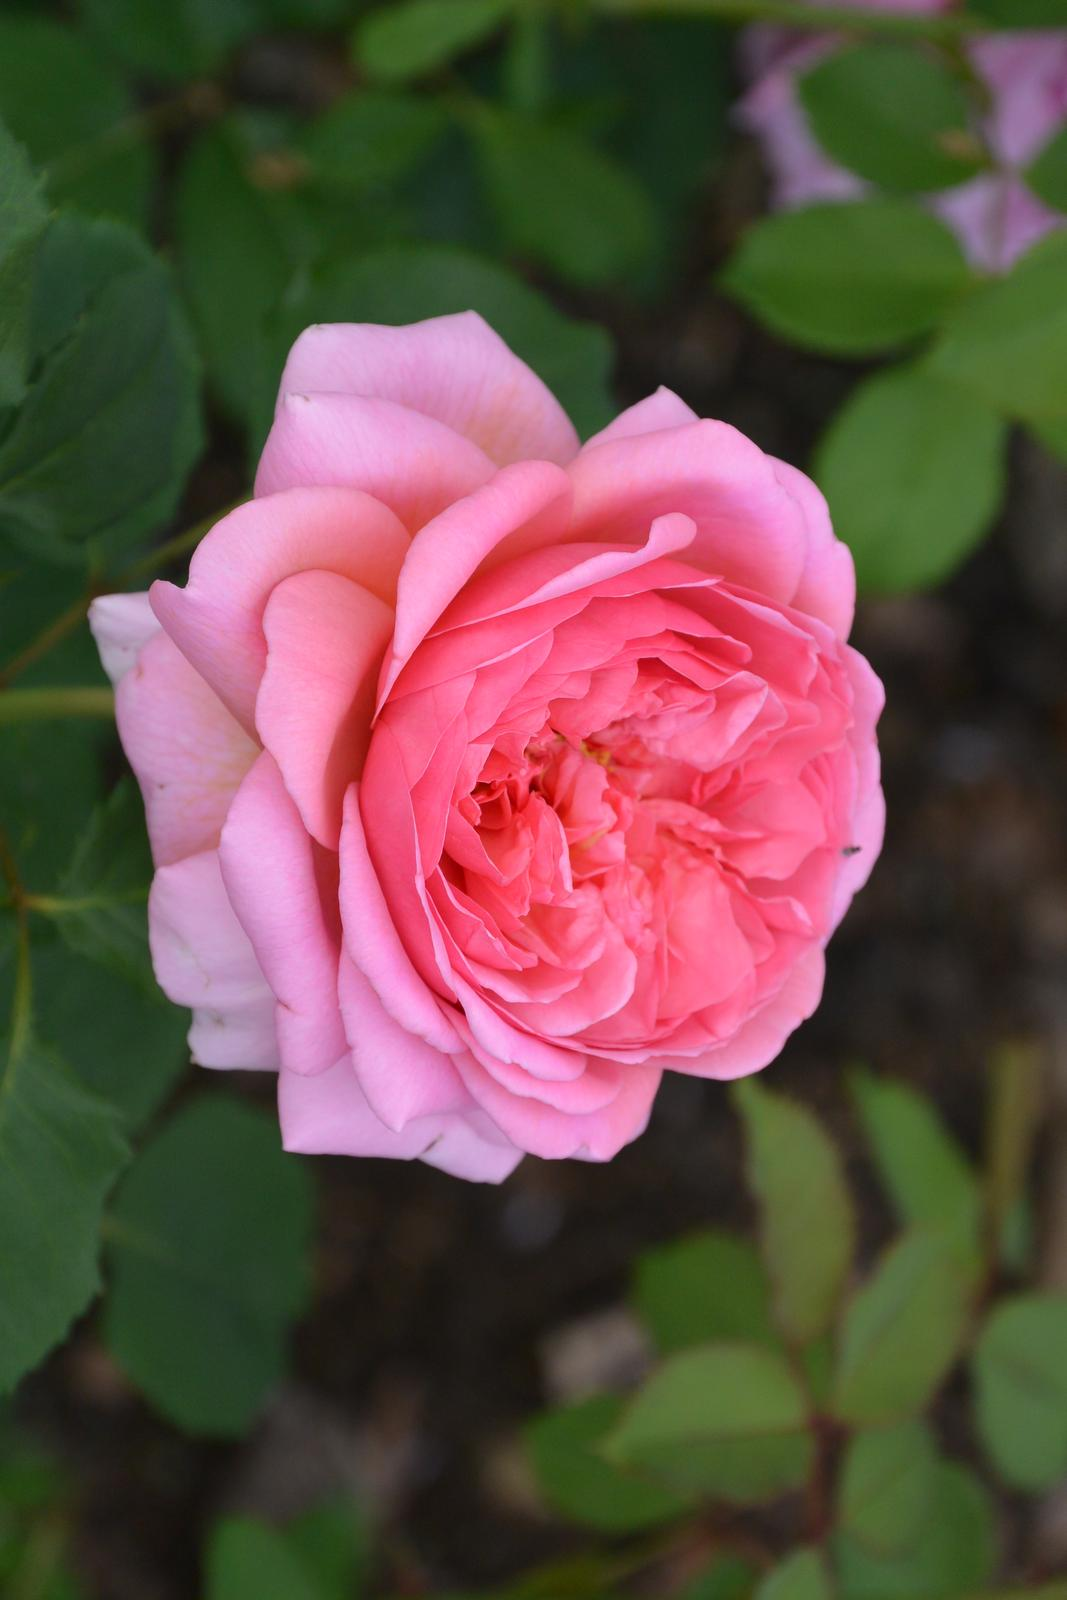 Motýlí zahrada 2019-2020 - Princess Alexandra of Kent